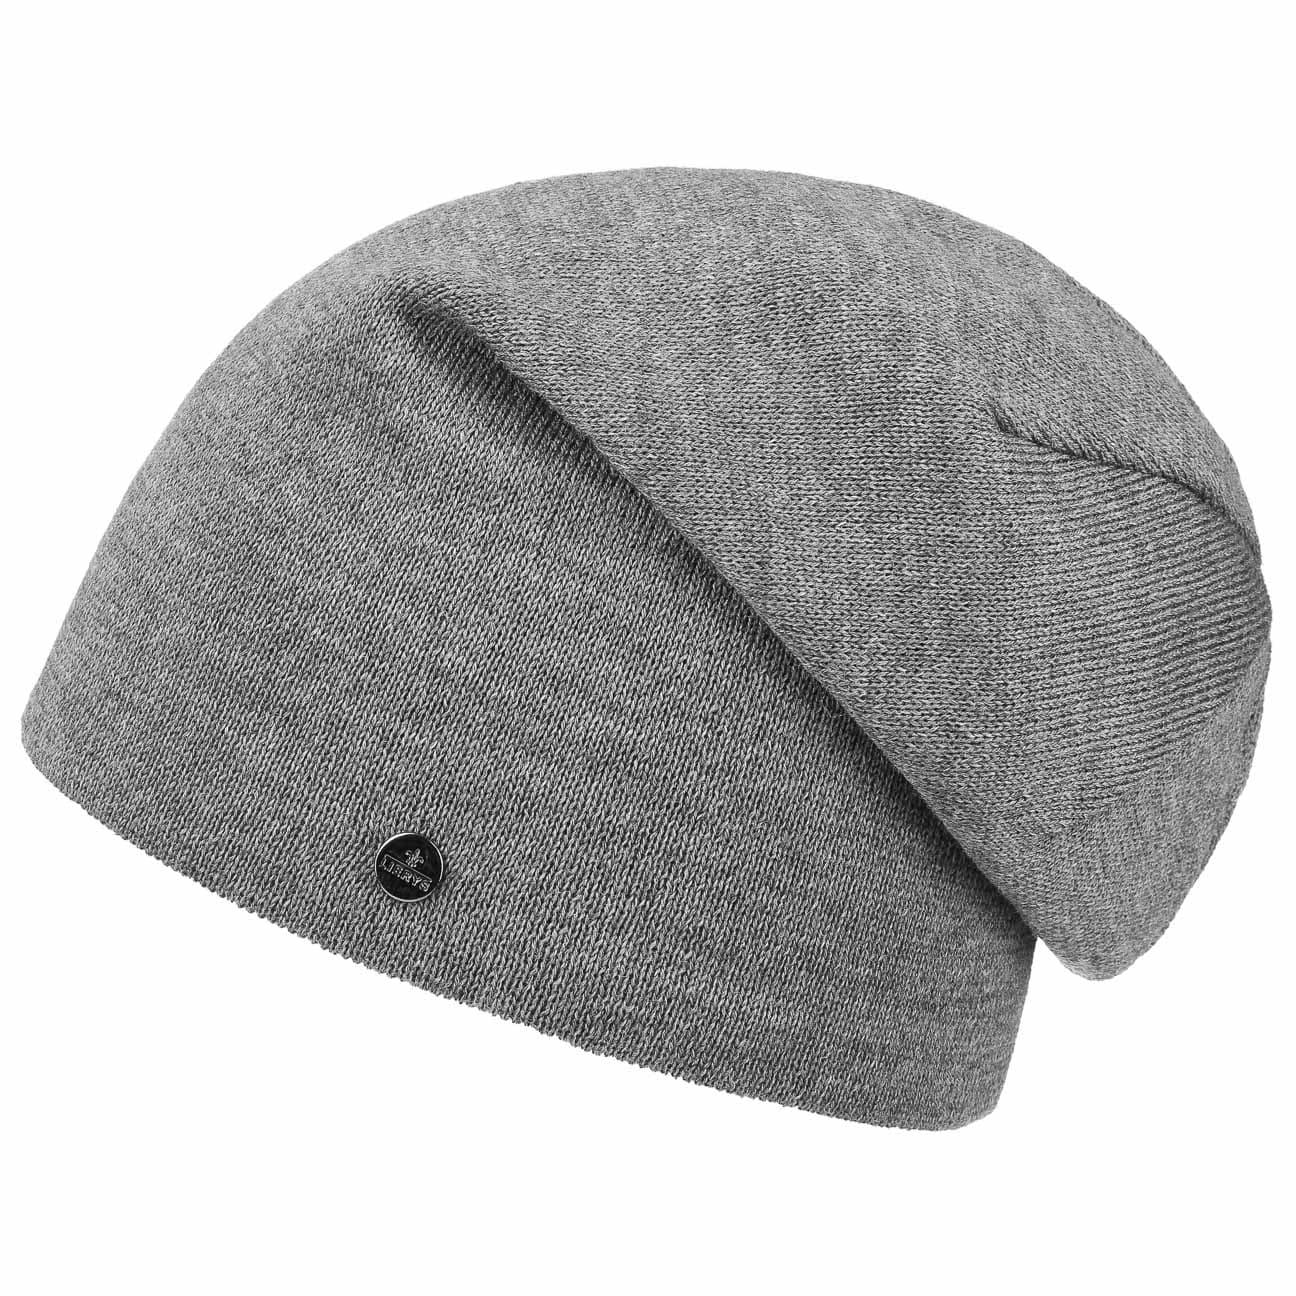 Bonnet Fine Merino Long Beanie by Lierys  bonnet pour femme